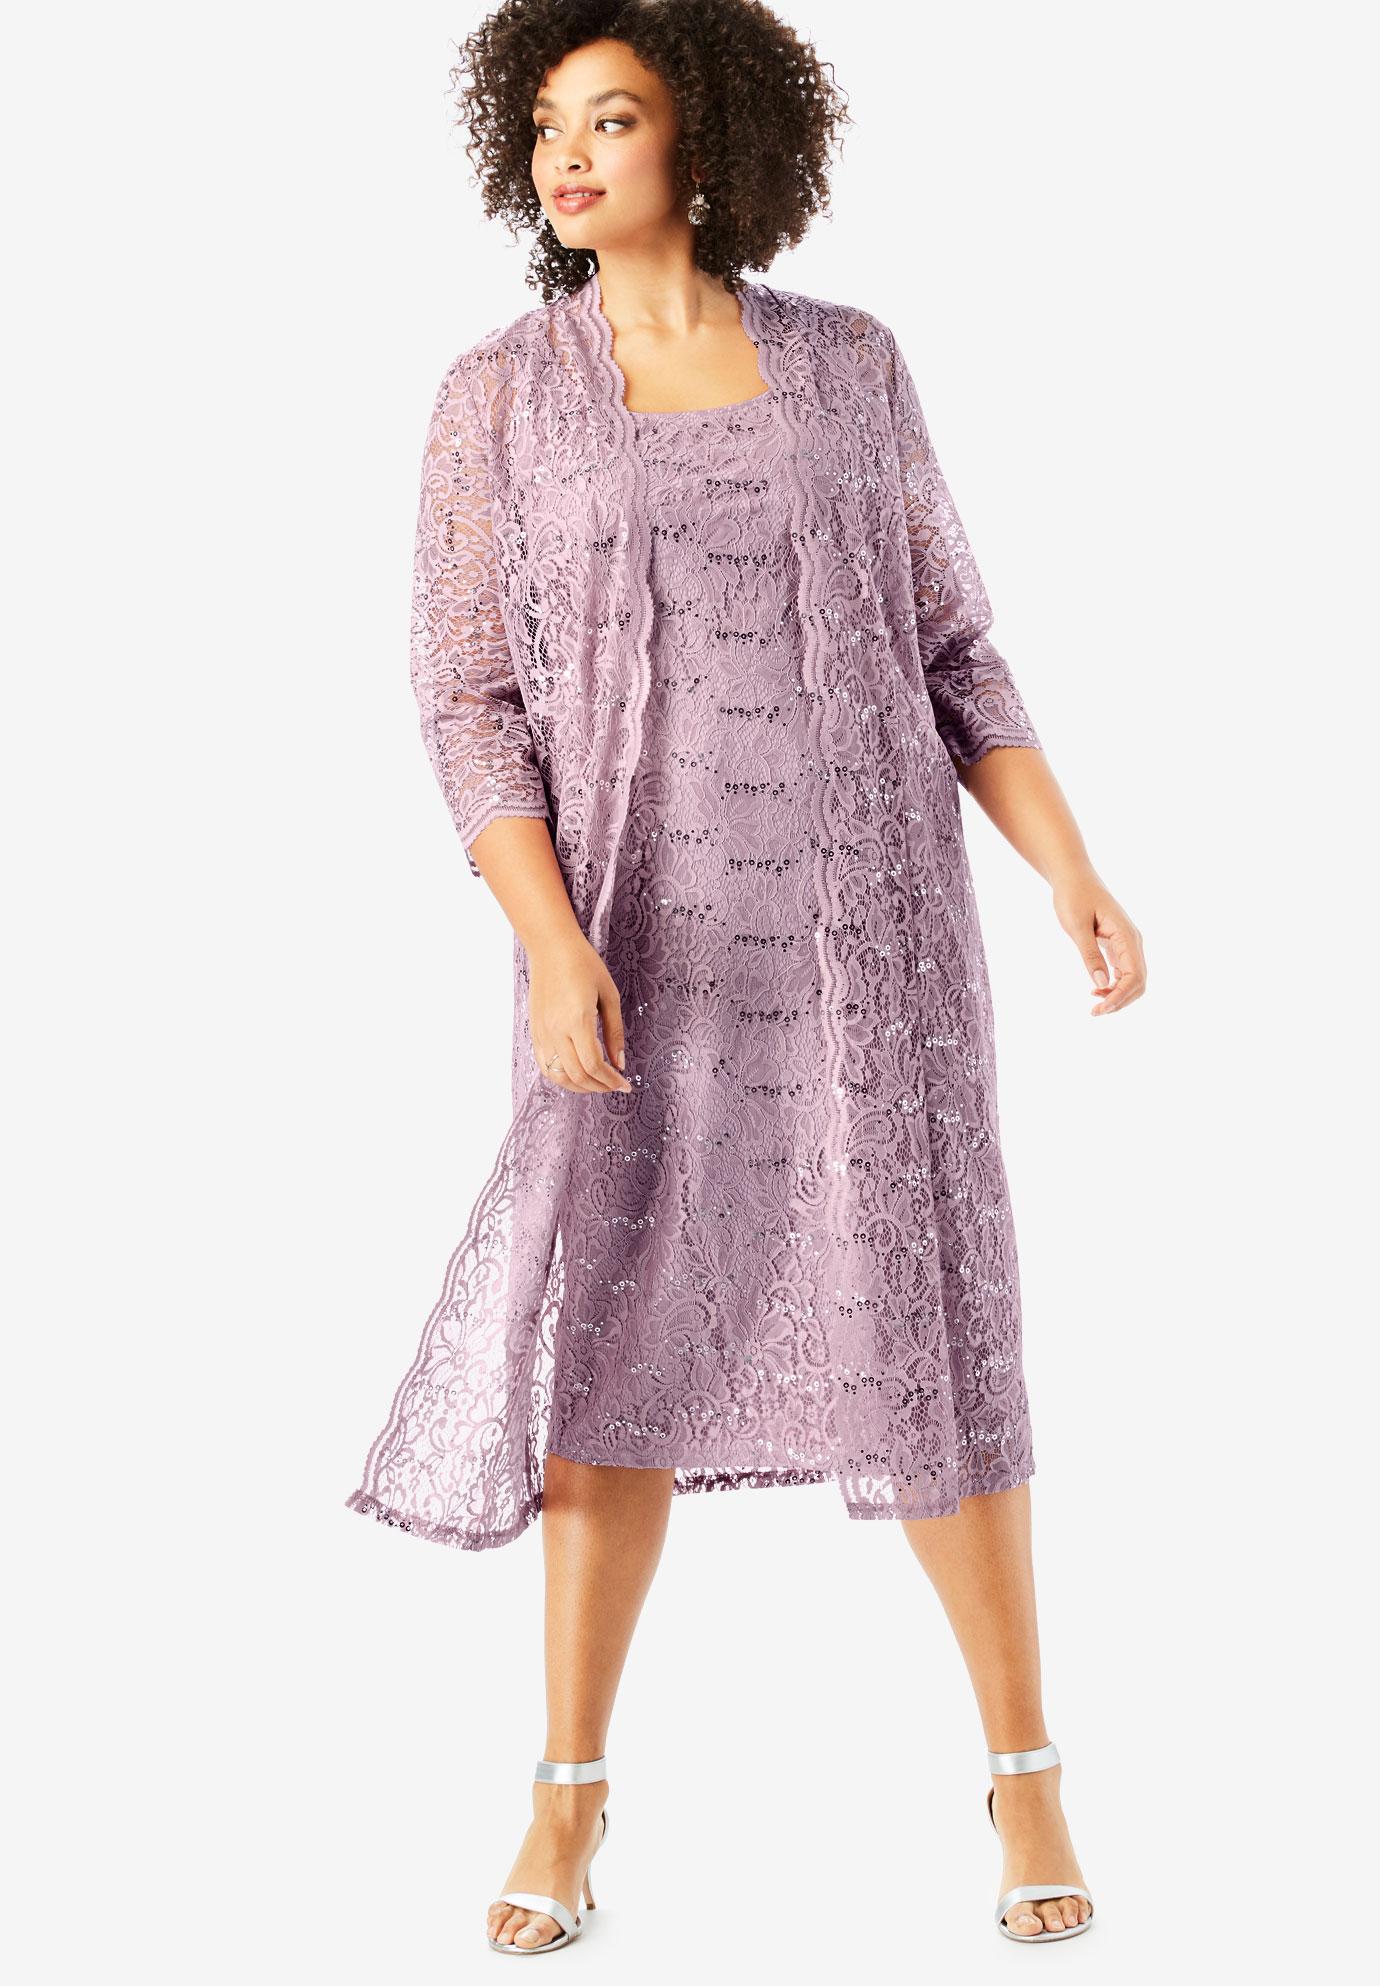 7eafecf9e799 Lace & Sequin Jacket Dress Set | Plus Size Formal & Special Occasion ...